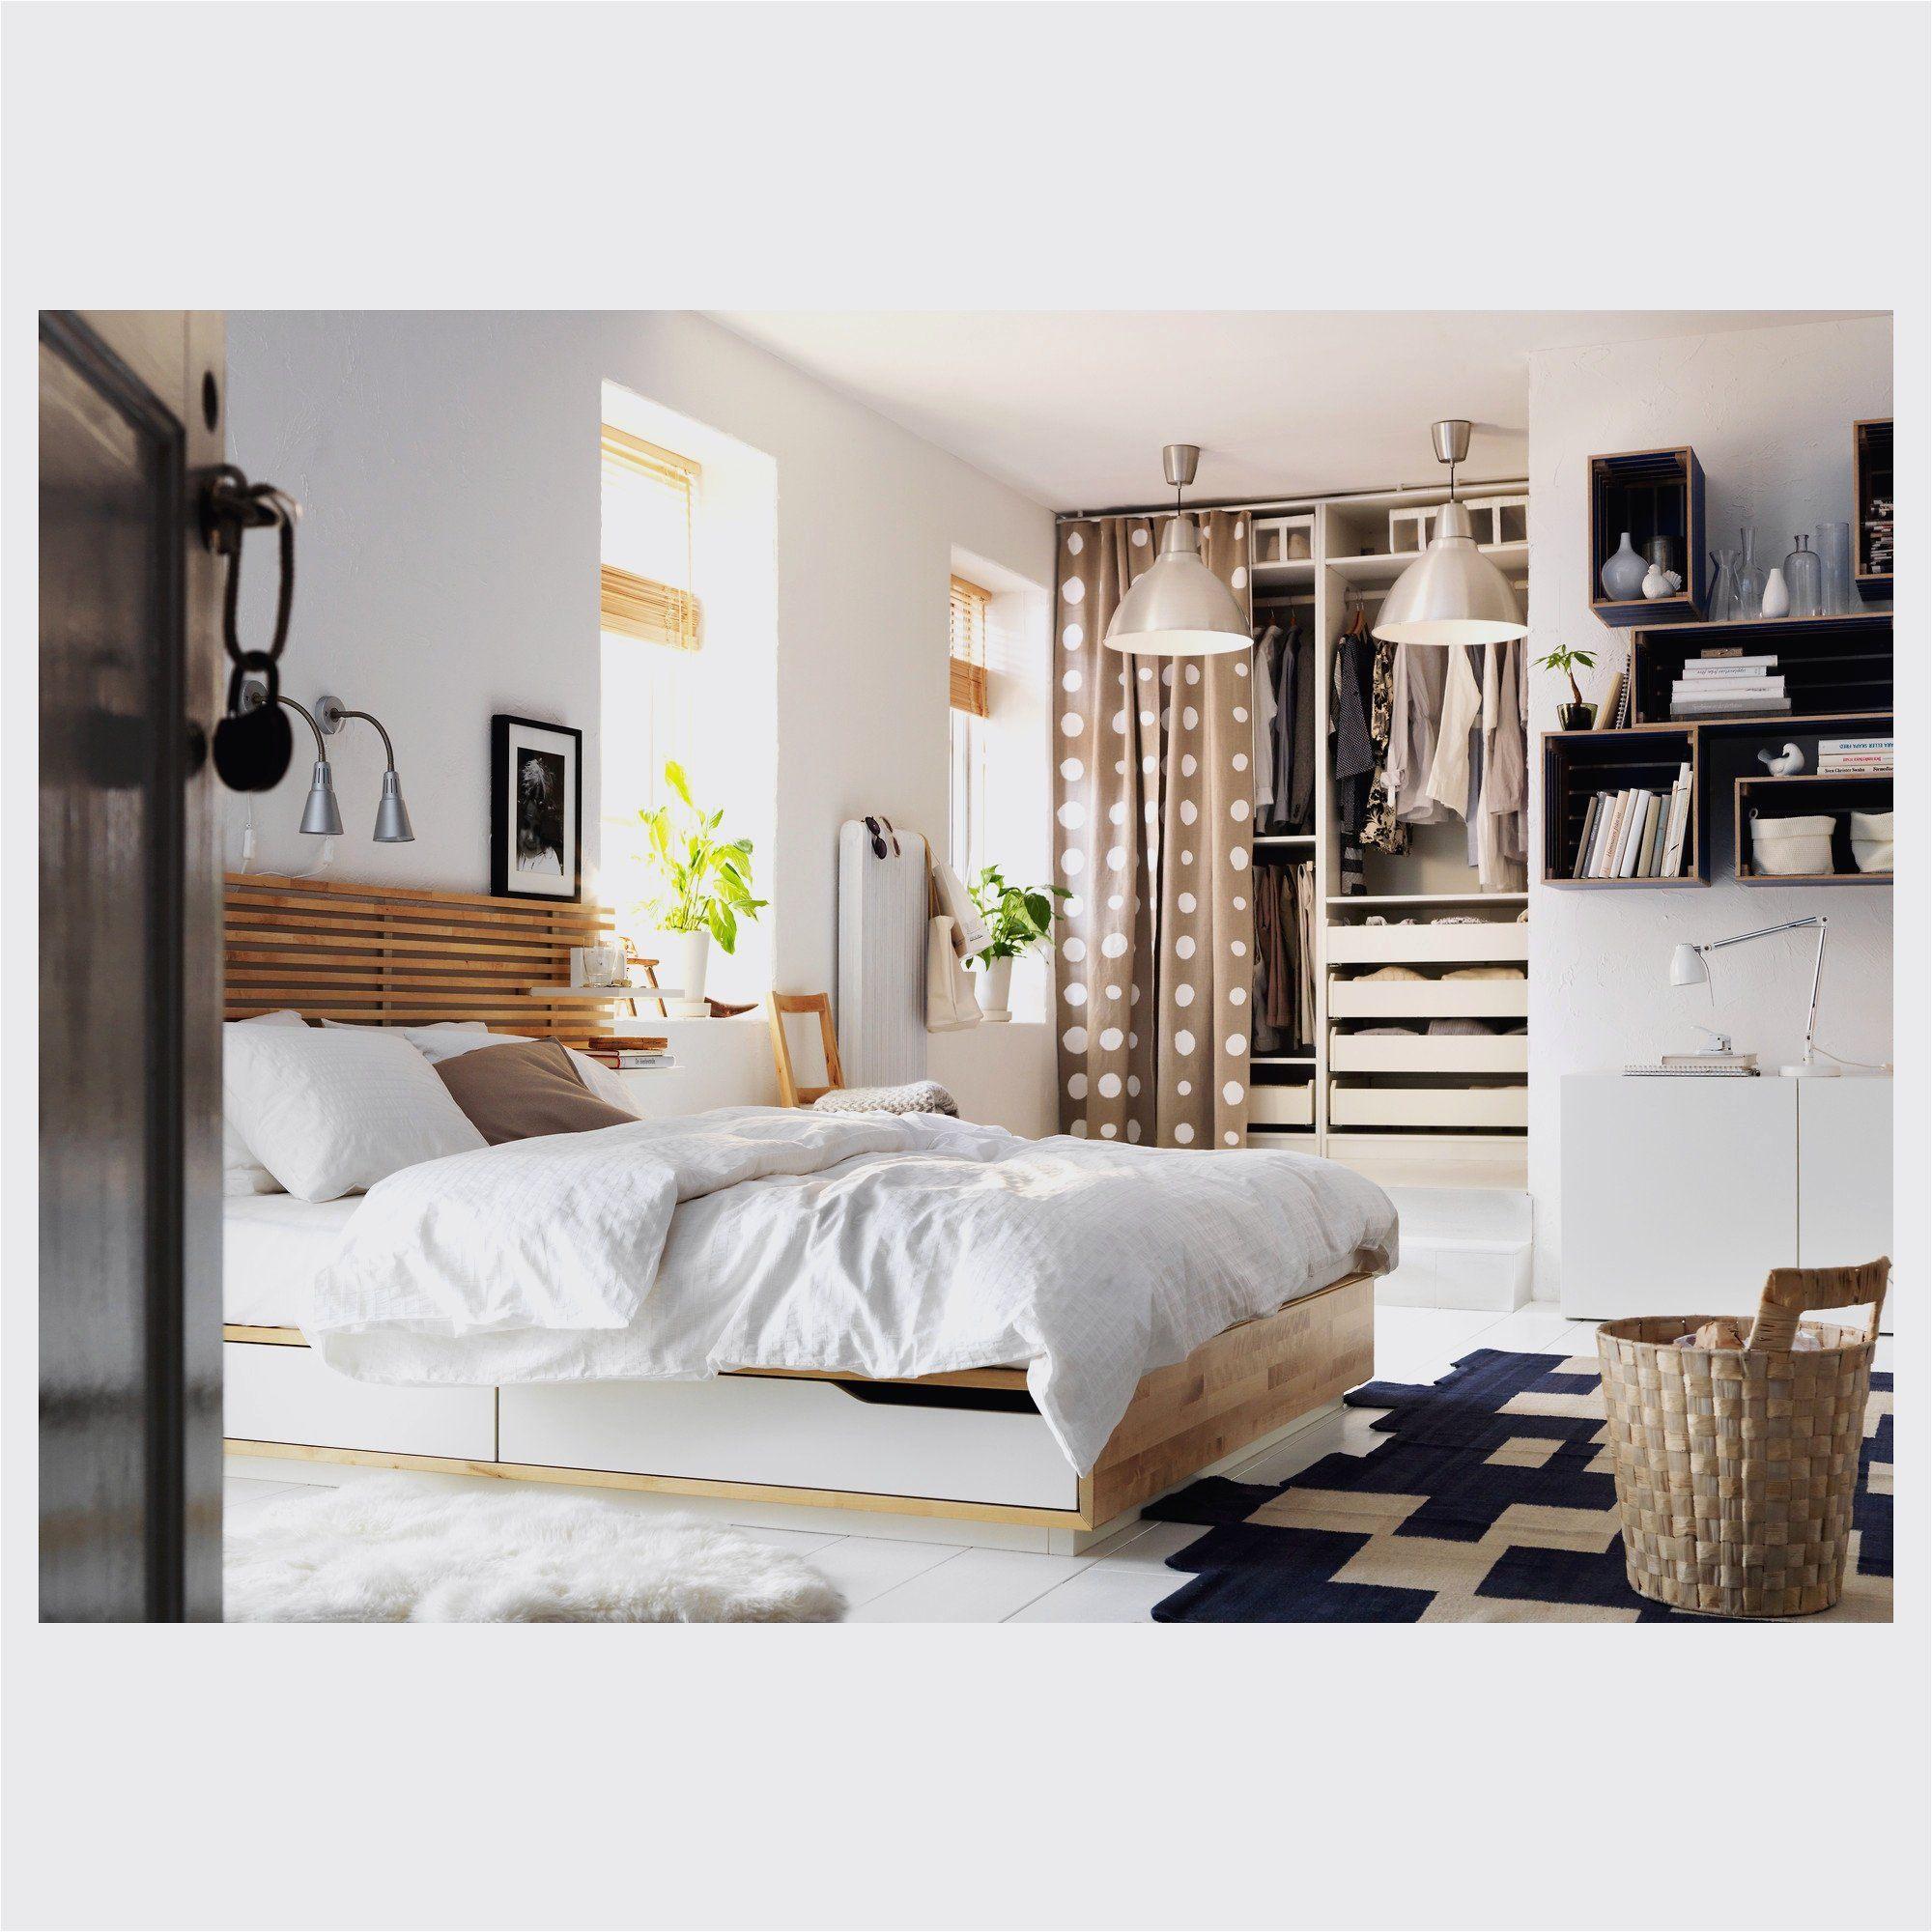 Tissu Tete De Lit Charmant Aller Chercher Etagere Tete De Lit Ikea Et Tete De Lit Ikea 180